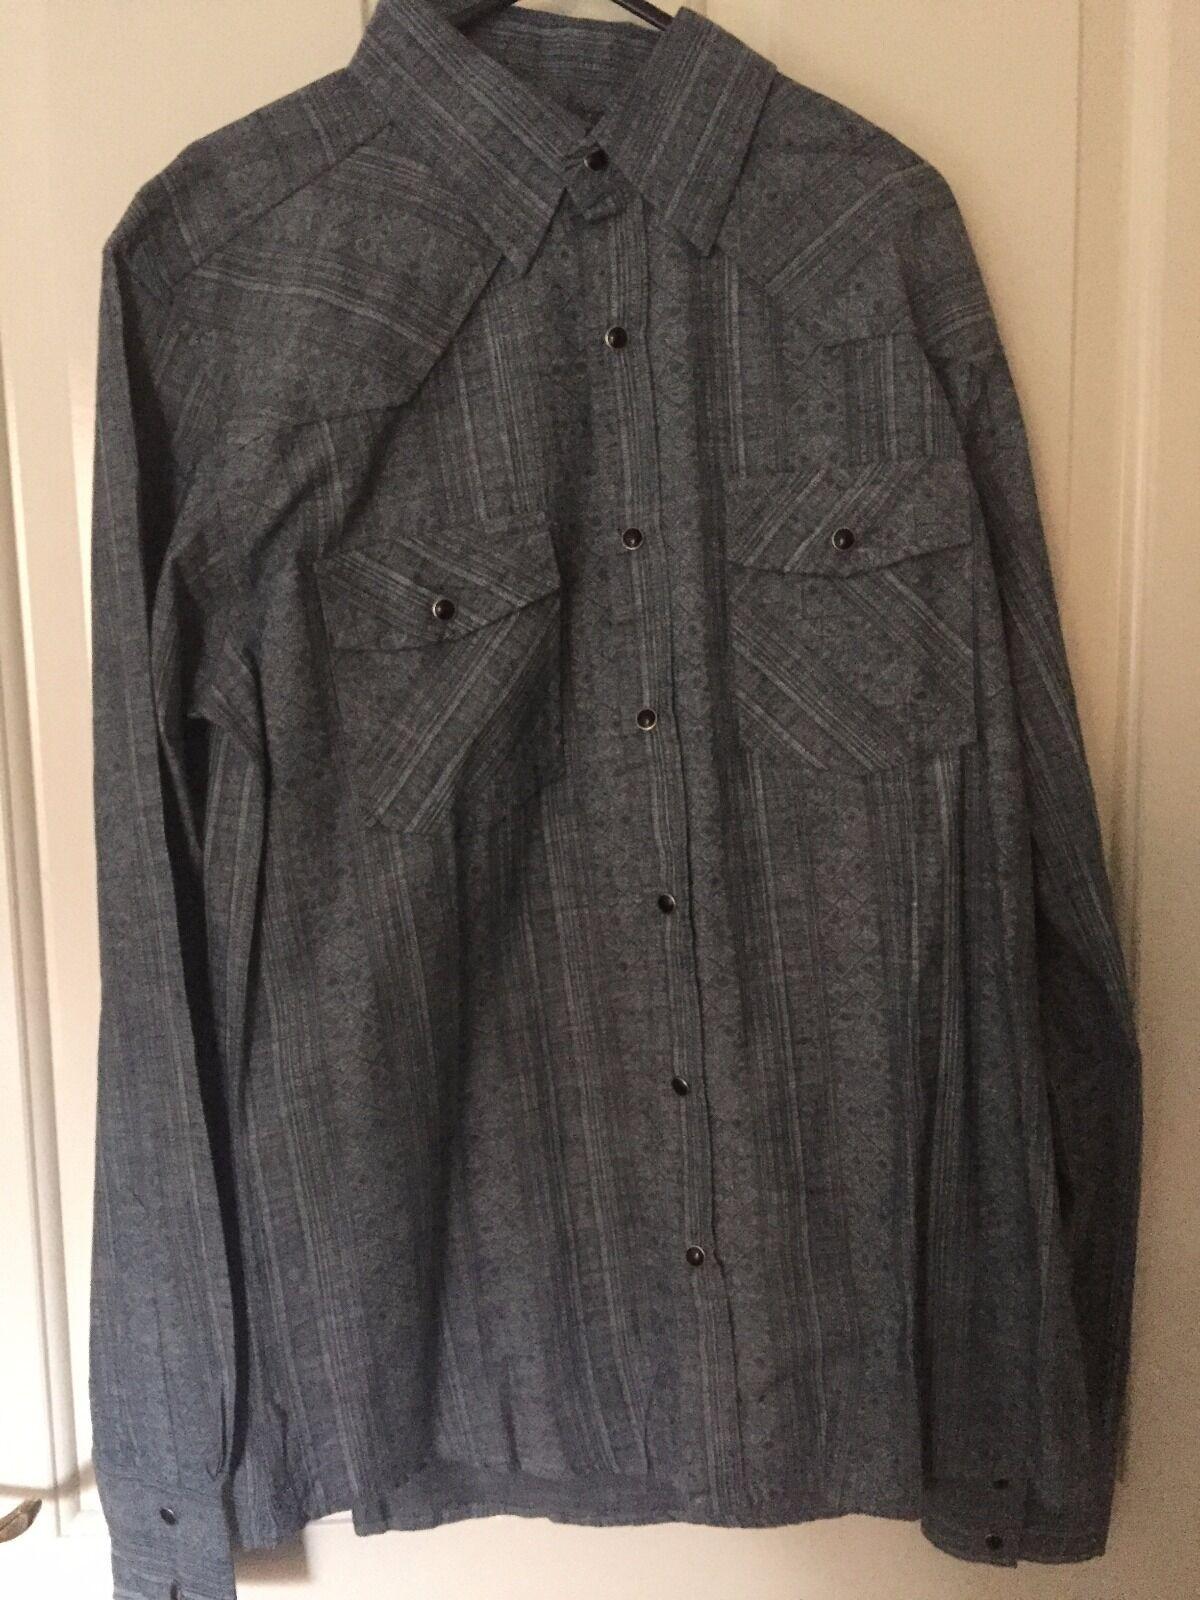 Men's bluee Denim Western Shirt With Aztec Print Design In Size Medium